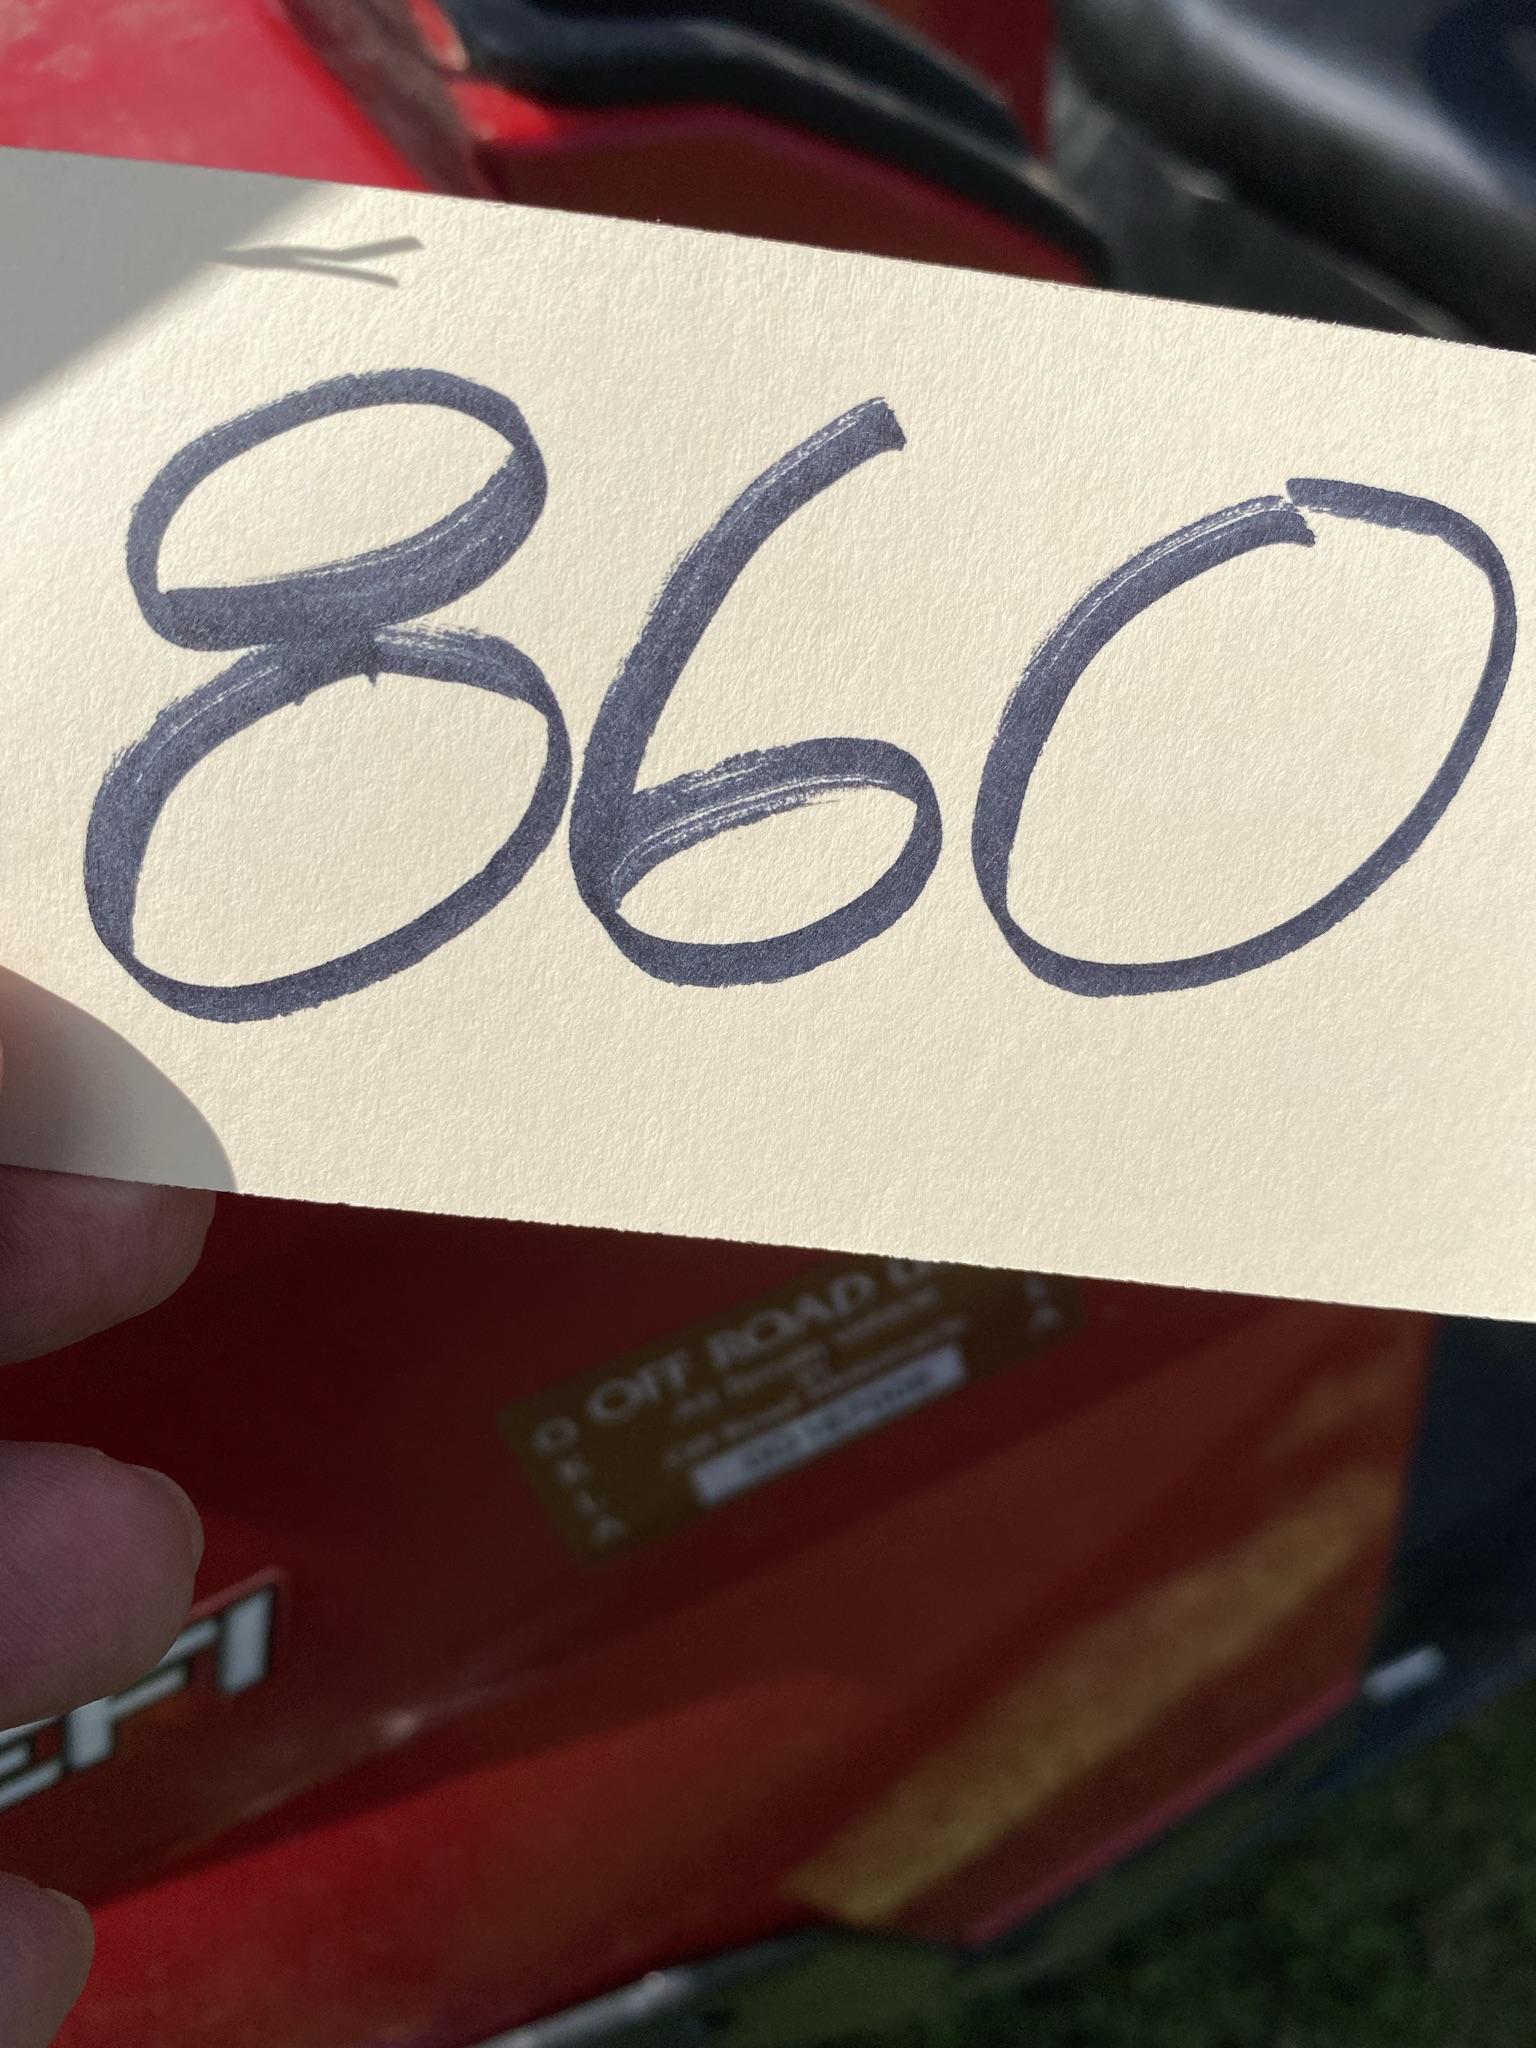 860 (1)